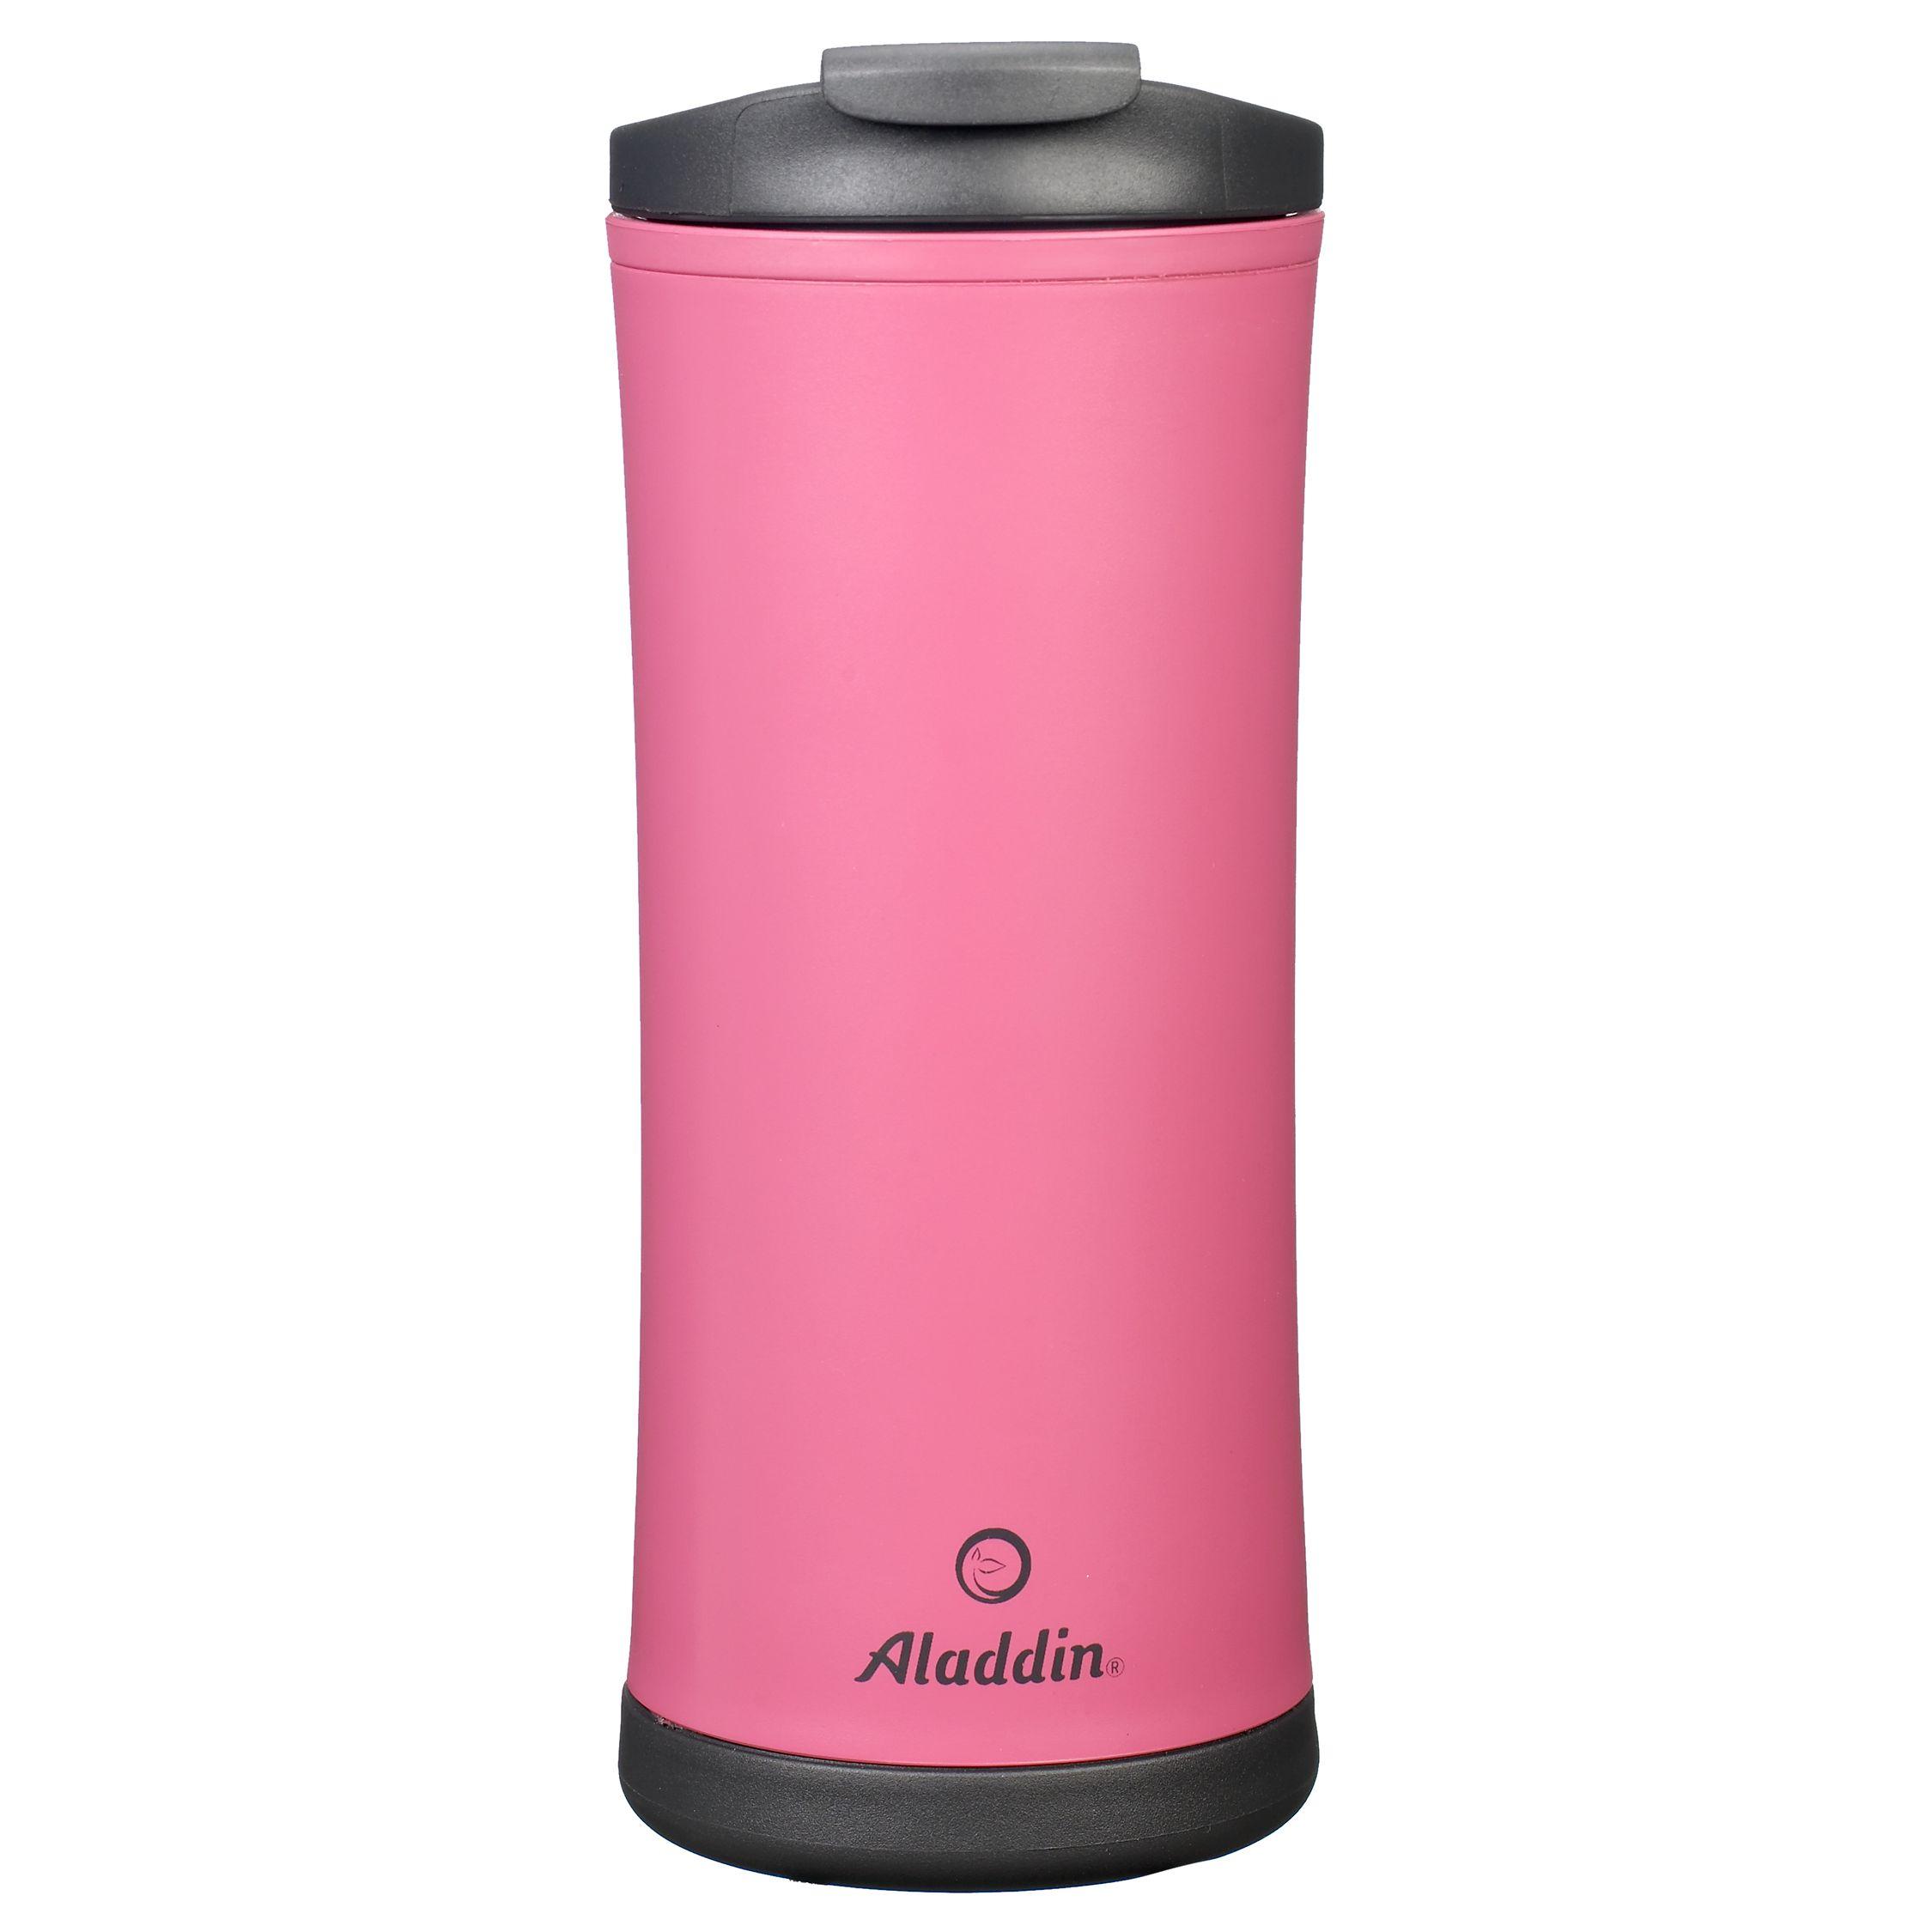 Aladdin Recycled Tumbler, Pink, 0.3L